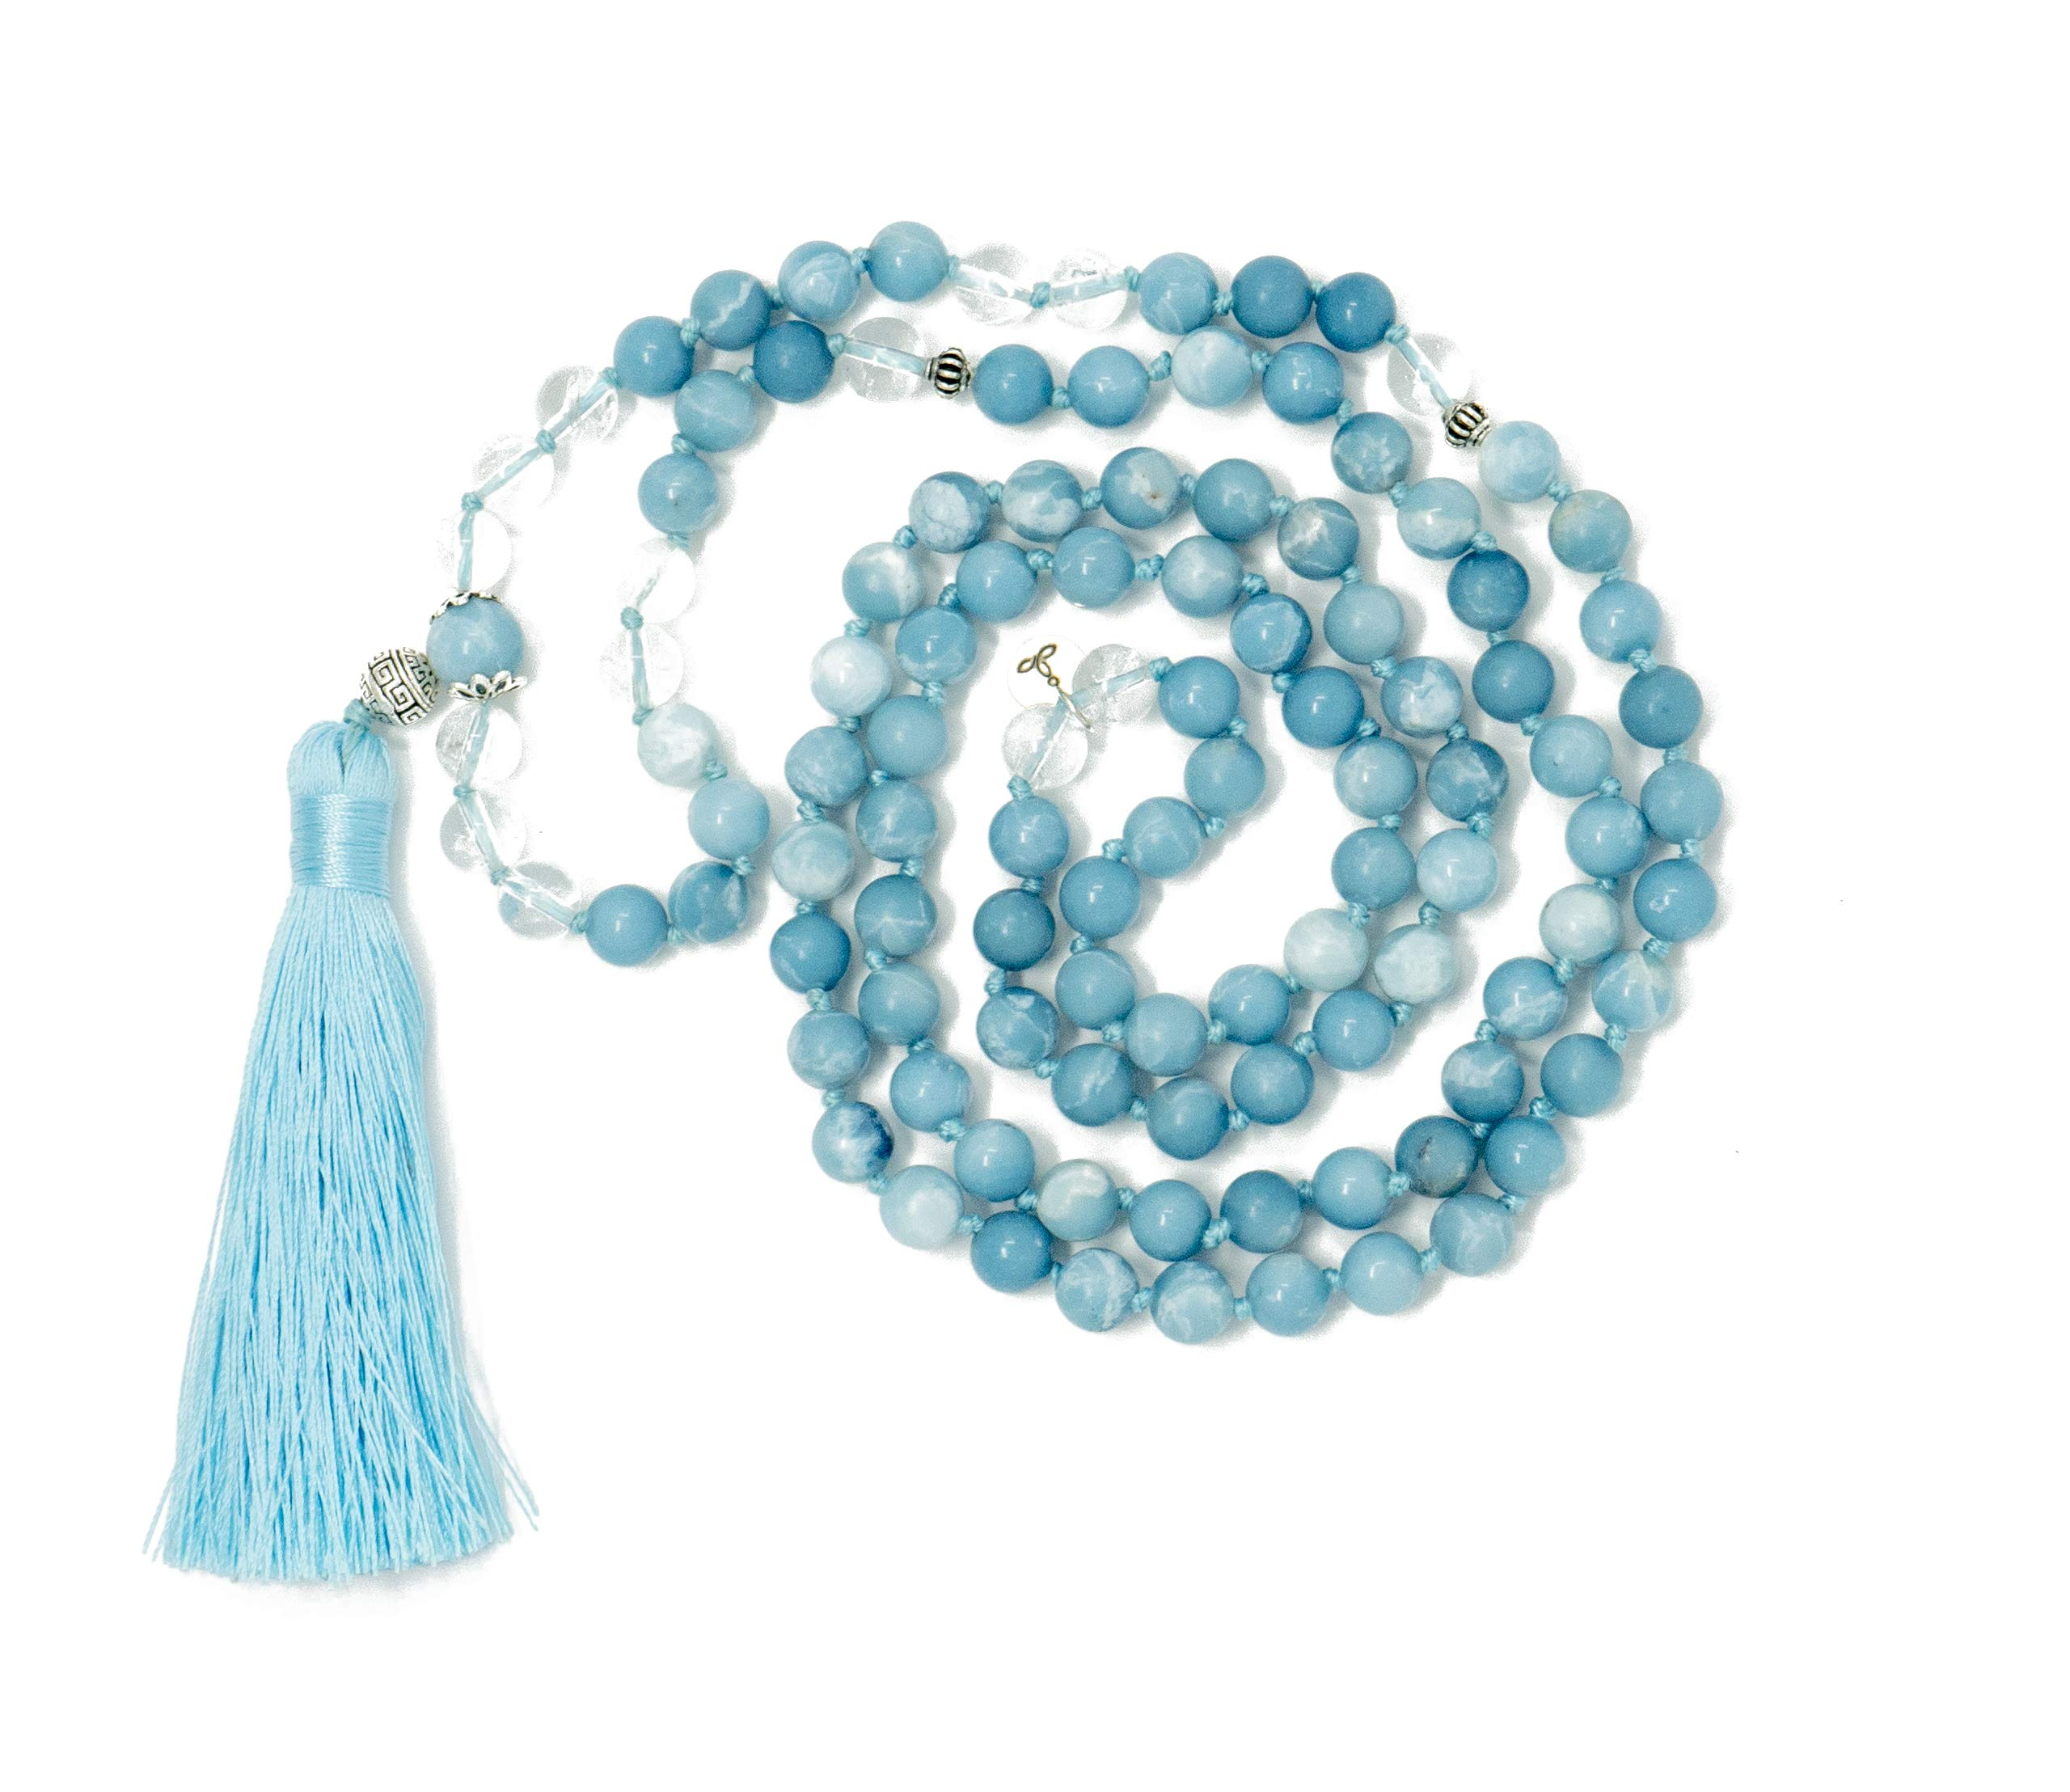 Larimar Accessories | Premium 8MM 108 Mala Beads Necklace with Tassel | Mala Gemstone Necklace | Mala Yoga Necklace | Mala Meditation Beads | Jewelry for Women Men | (Larimar & Clear Quartz) by Larimar Accessories